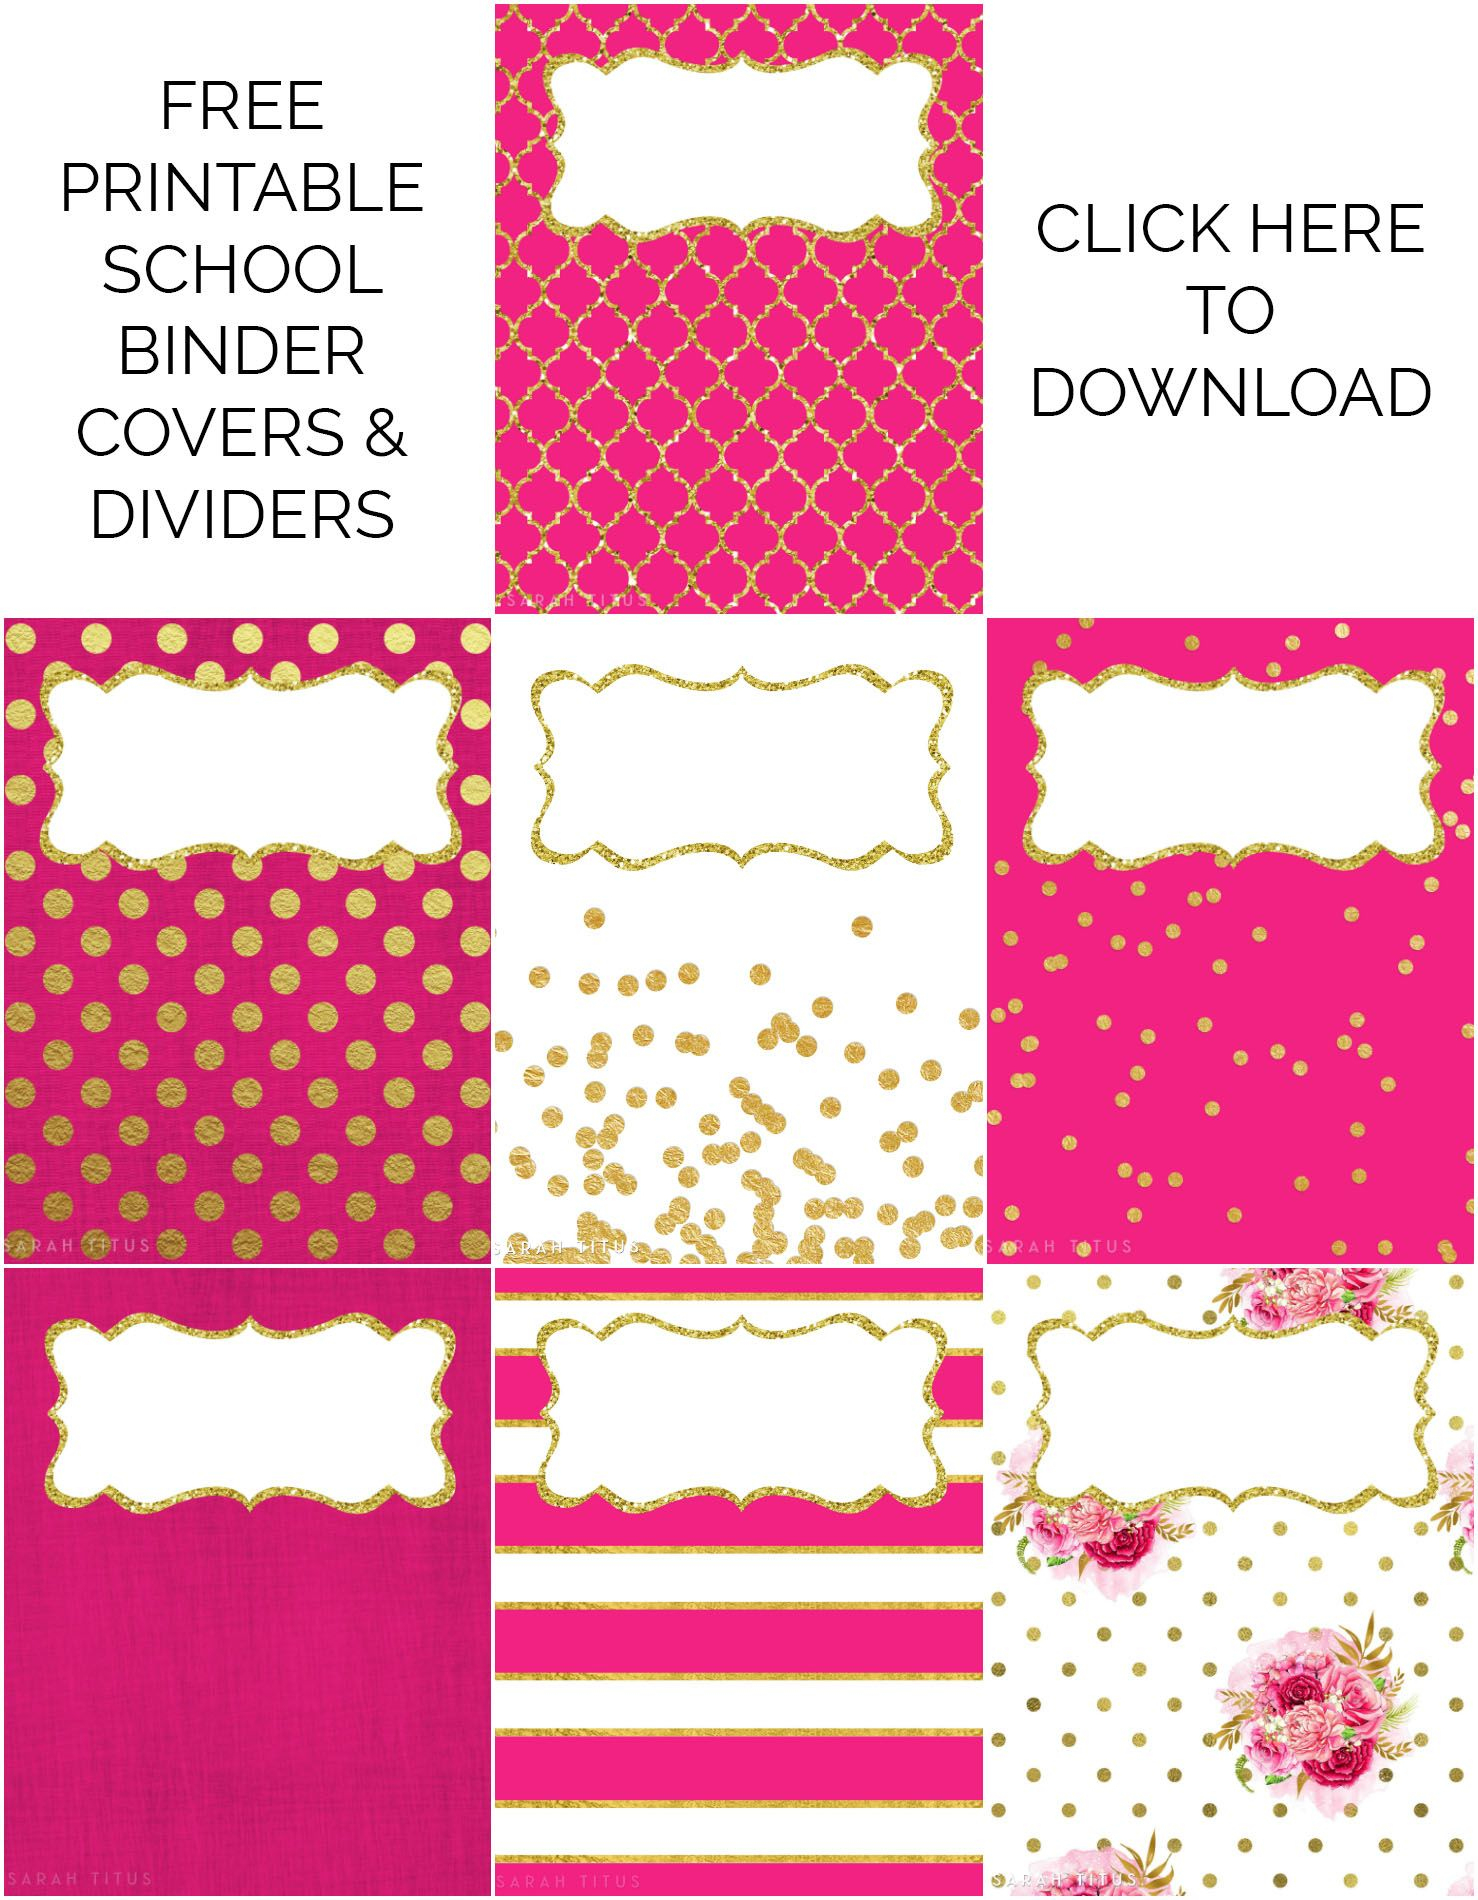 Binder Covers / Dividers Free Printables   Plans   Binder Covers - Free Printable School Binder Covers